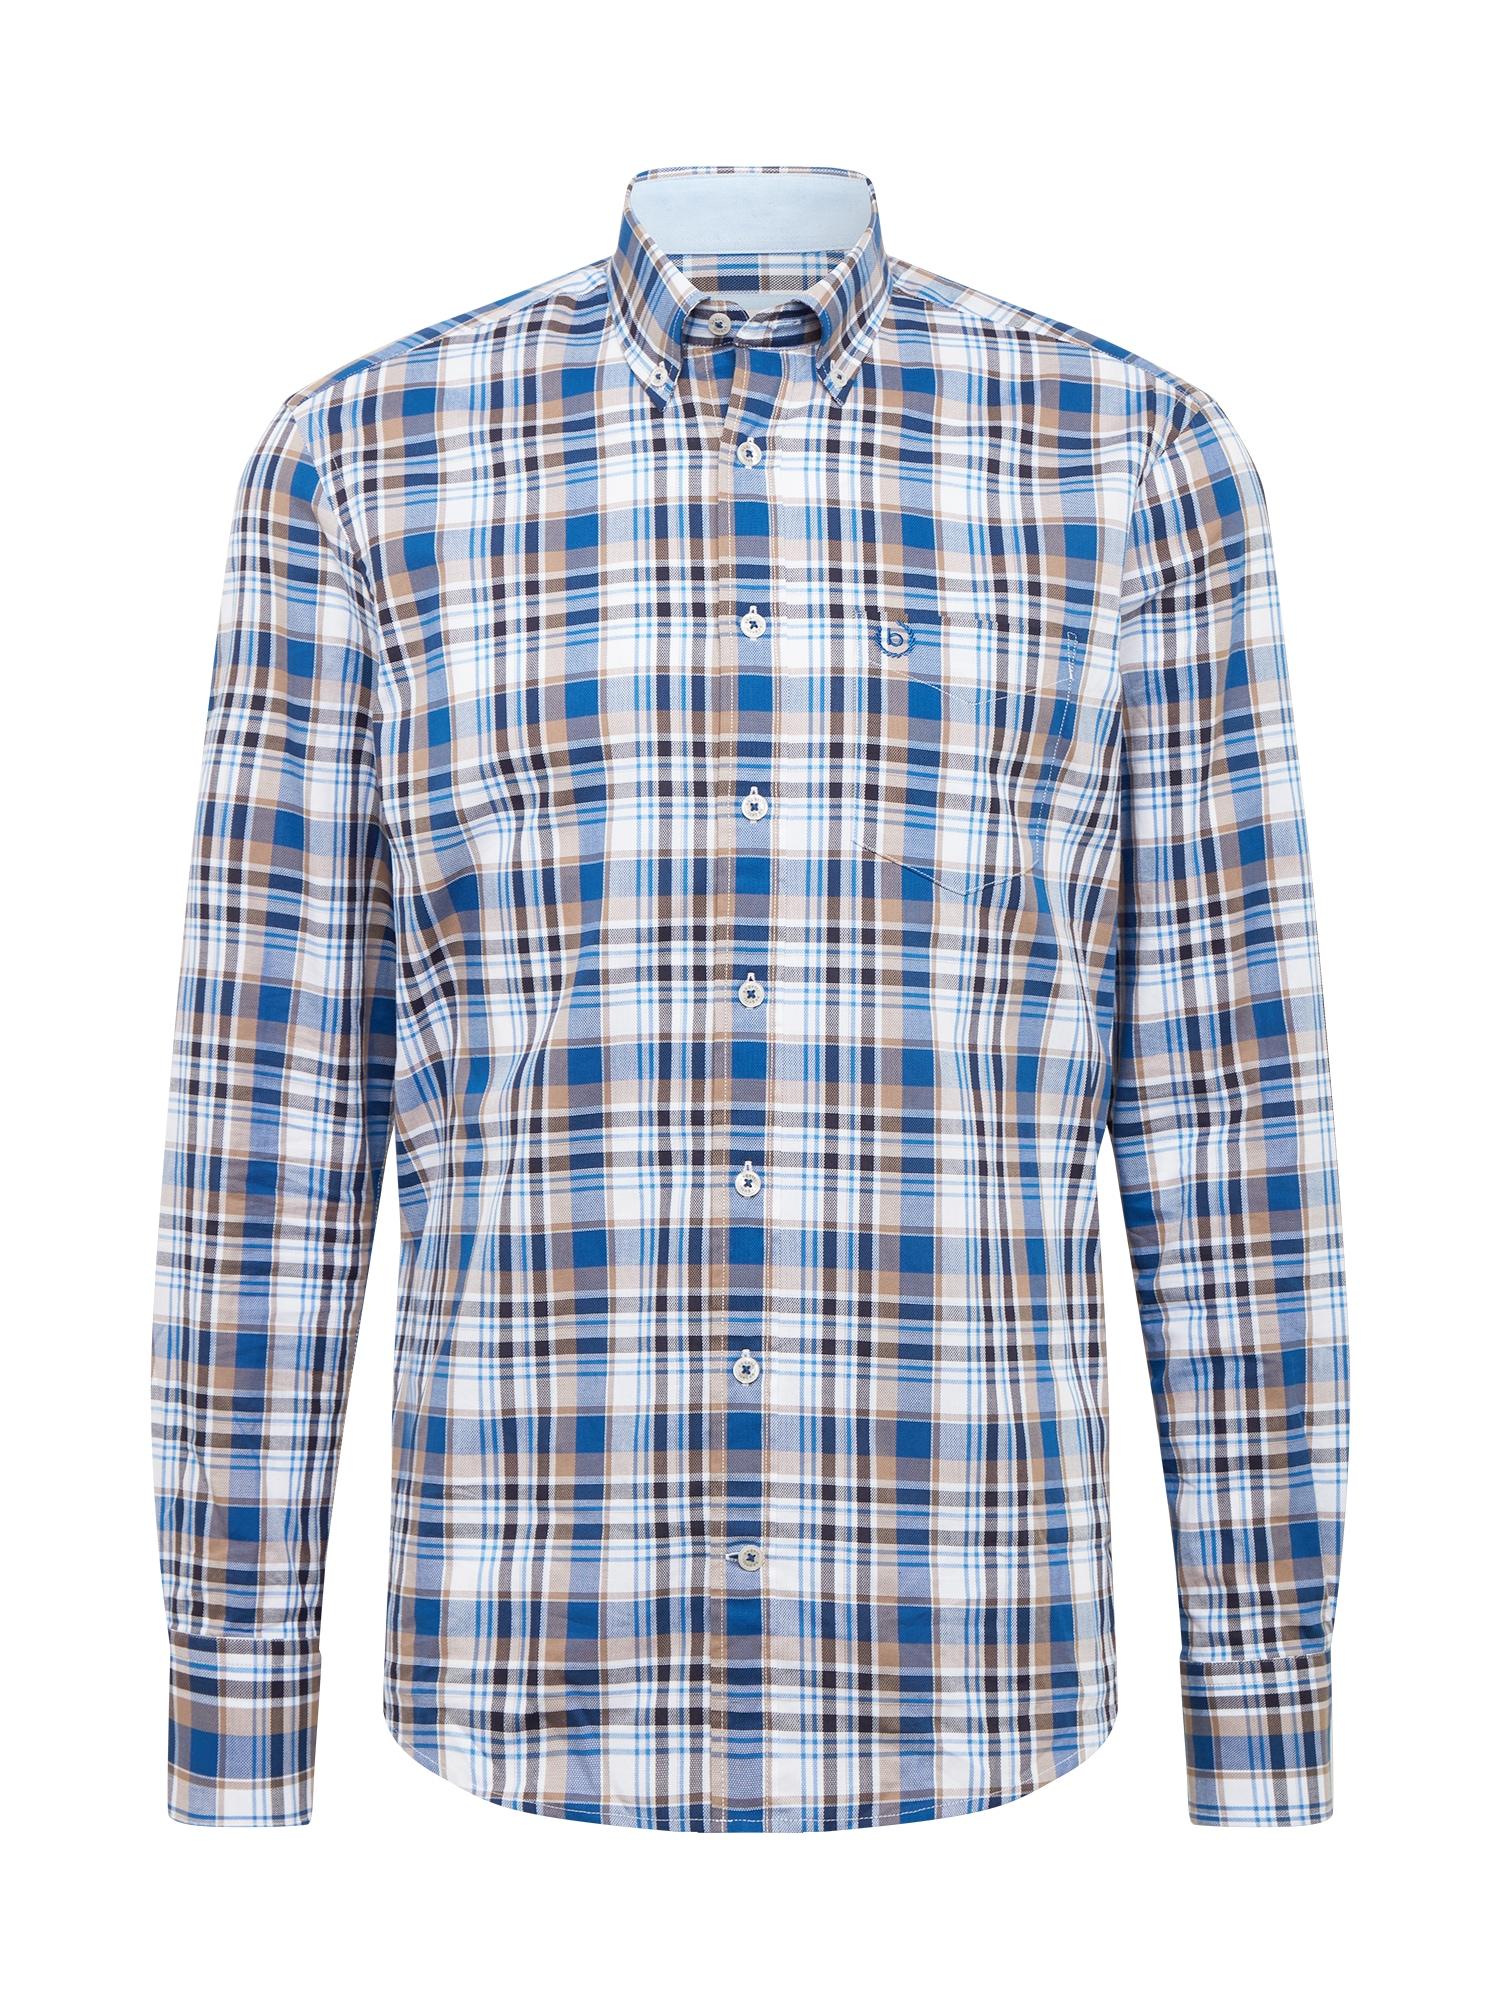 bugatti Marškiniai tamsiai mėlyna / mėlyna / balta / gelsvai pilka spalva